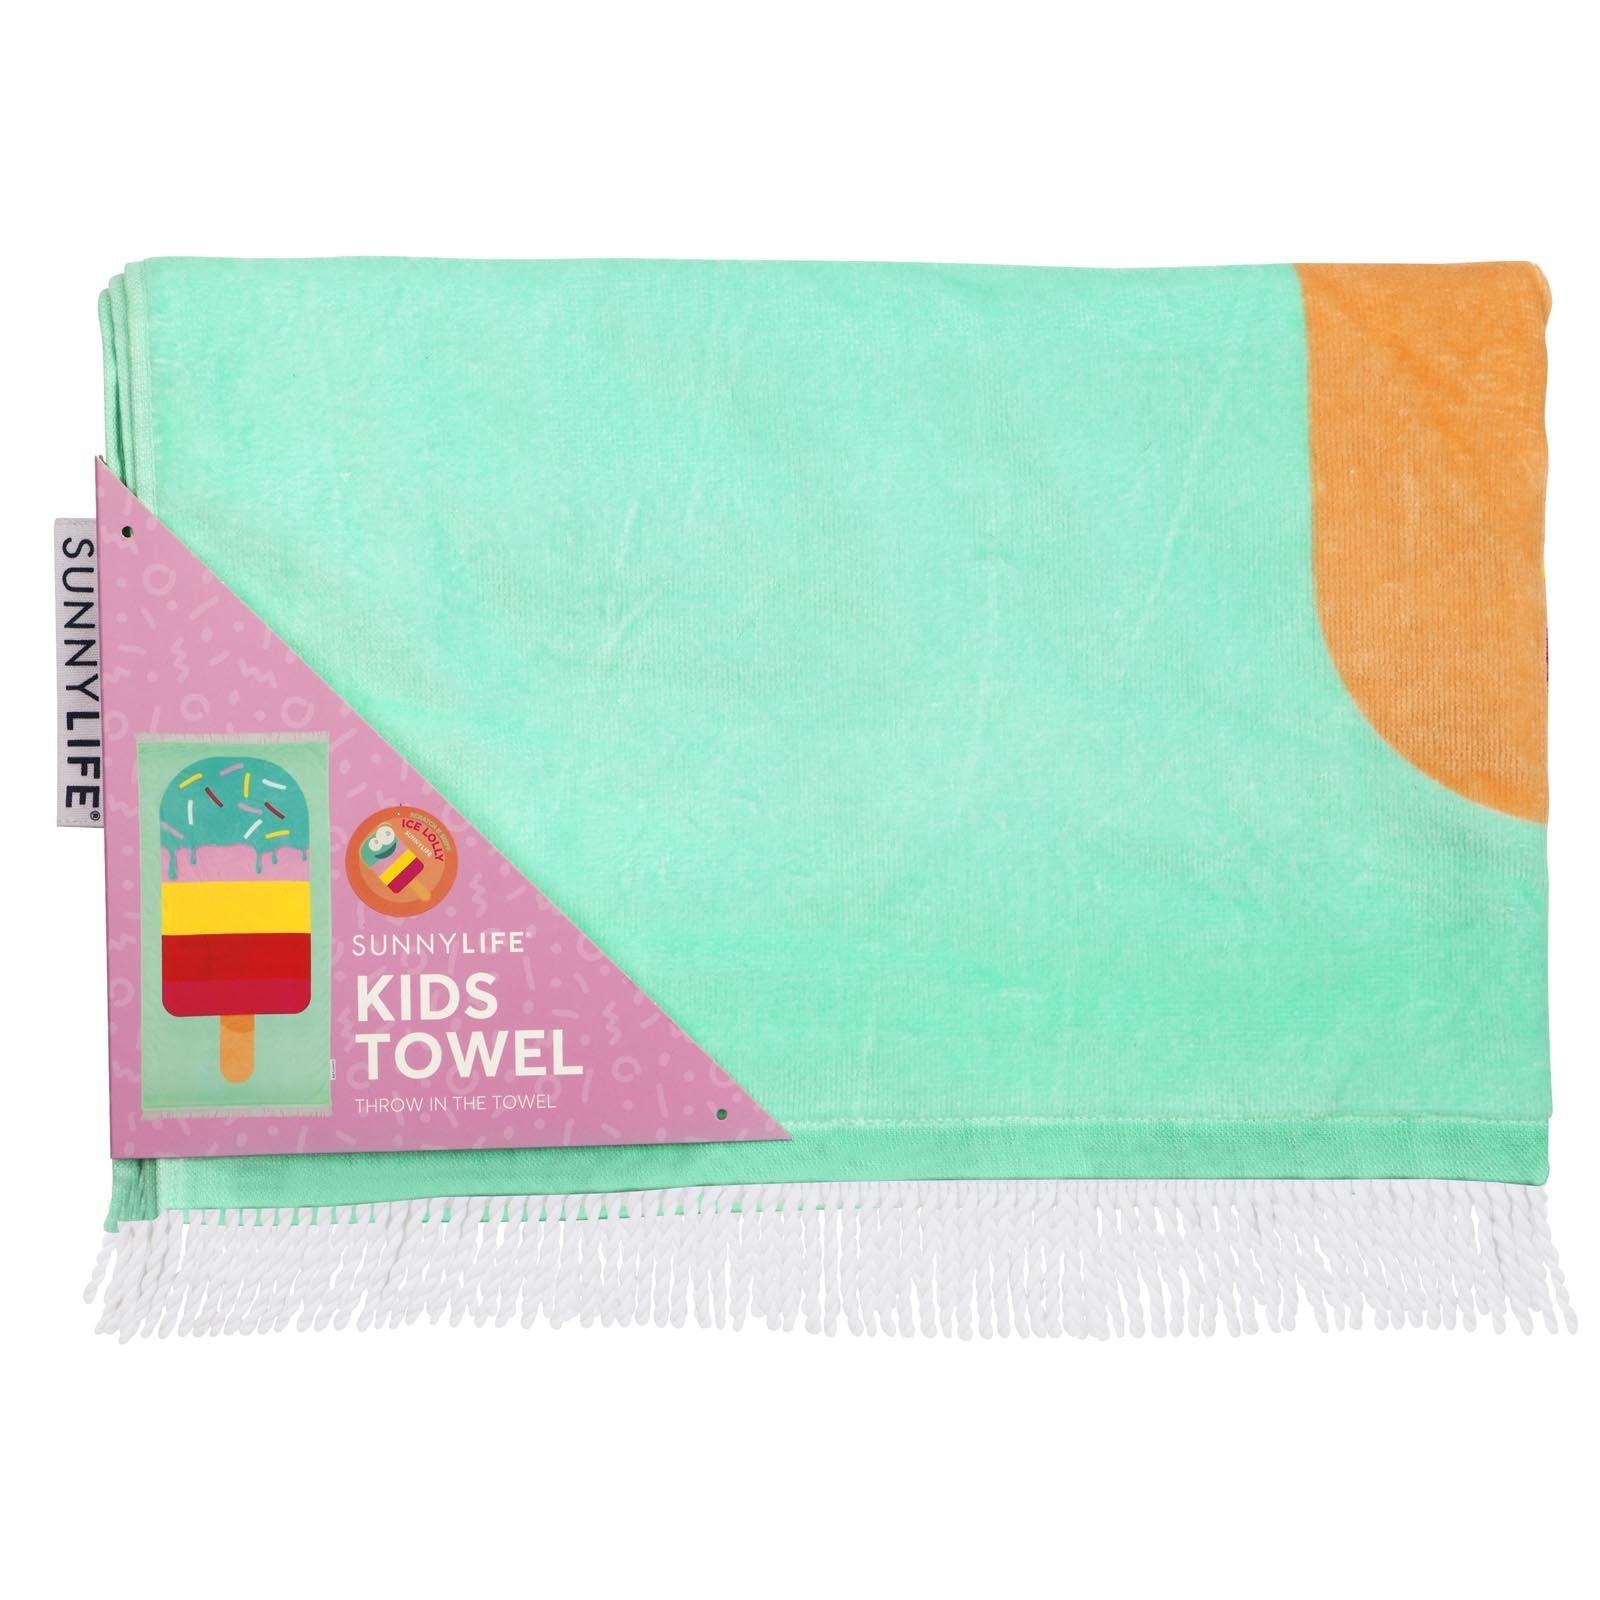 drap de plage enfant imprim glace kids towel ice lolly. Black Bedroom Furniture Sets. Home Design Ideas